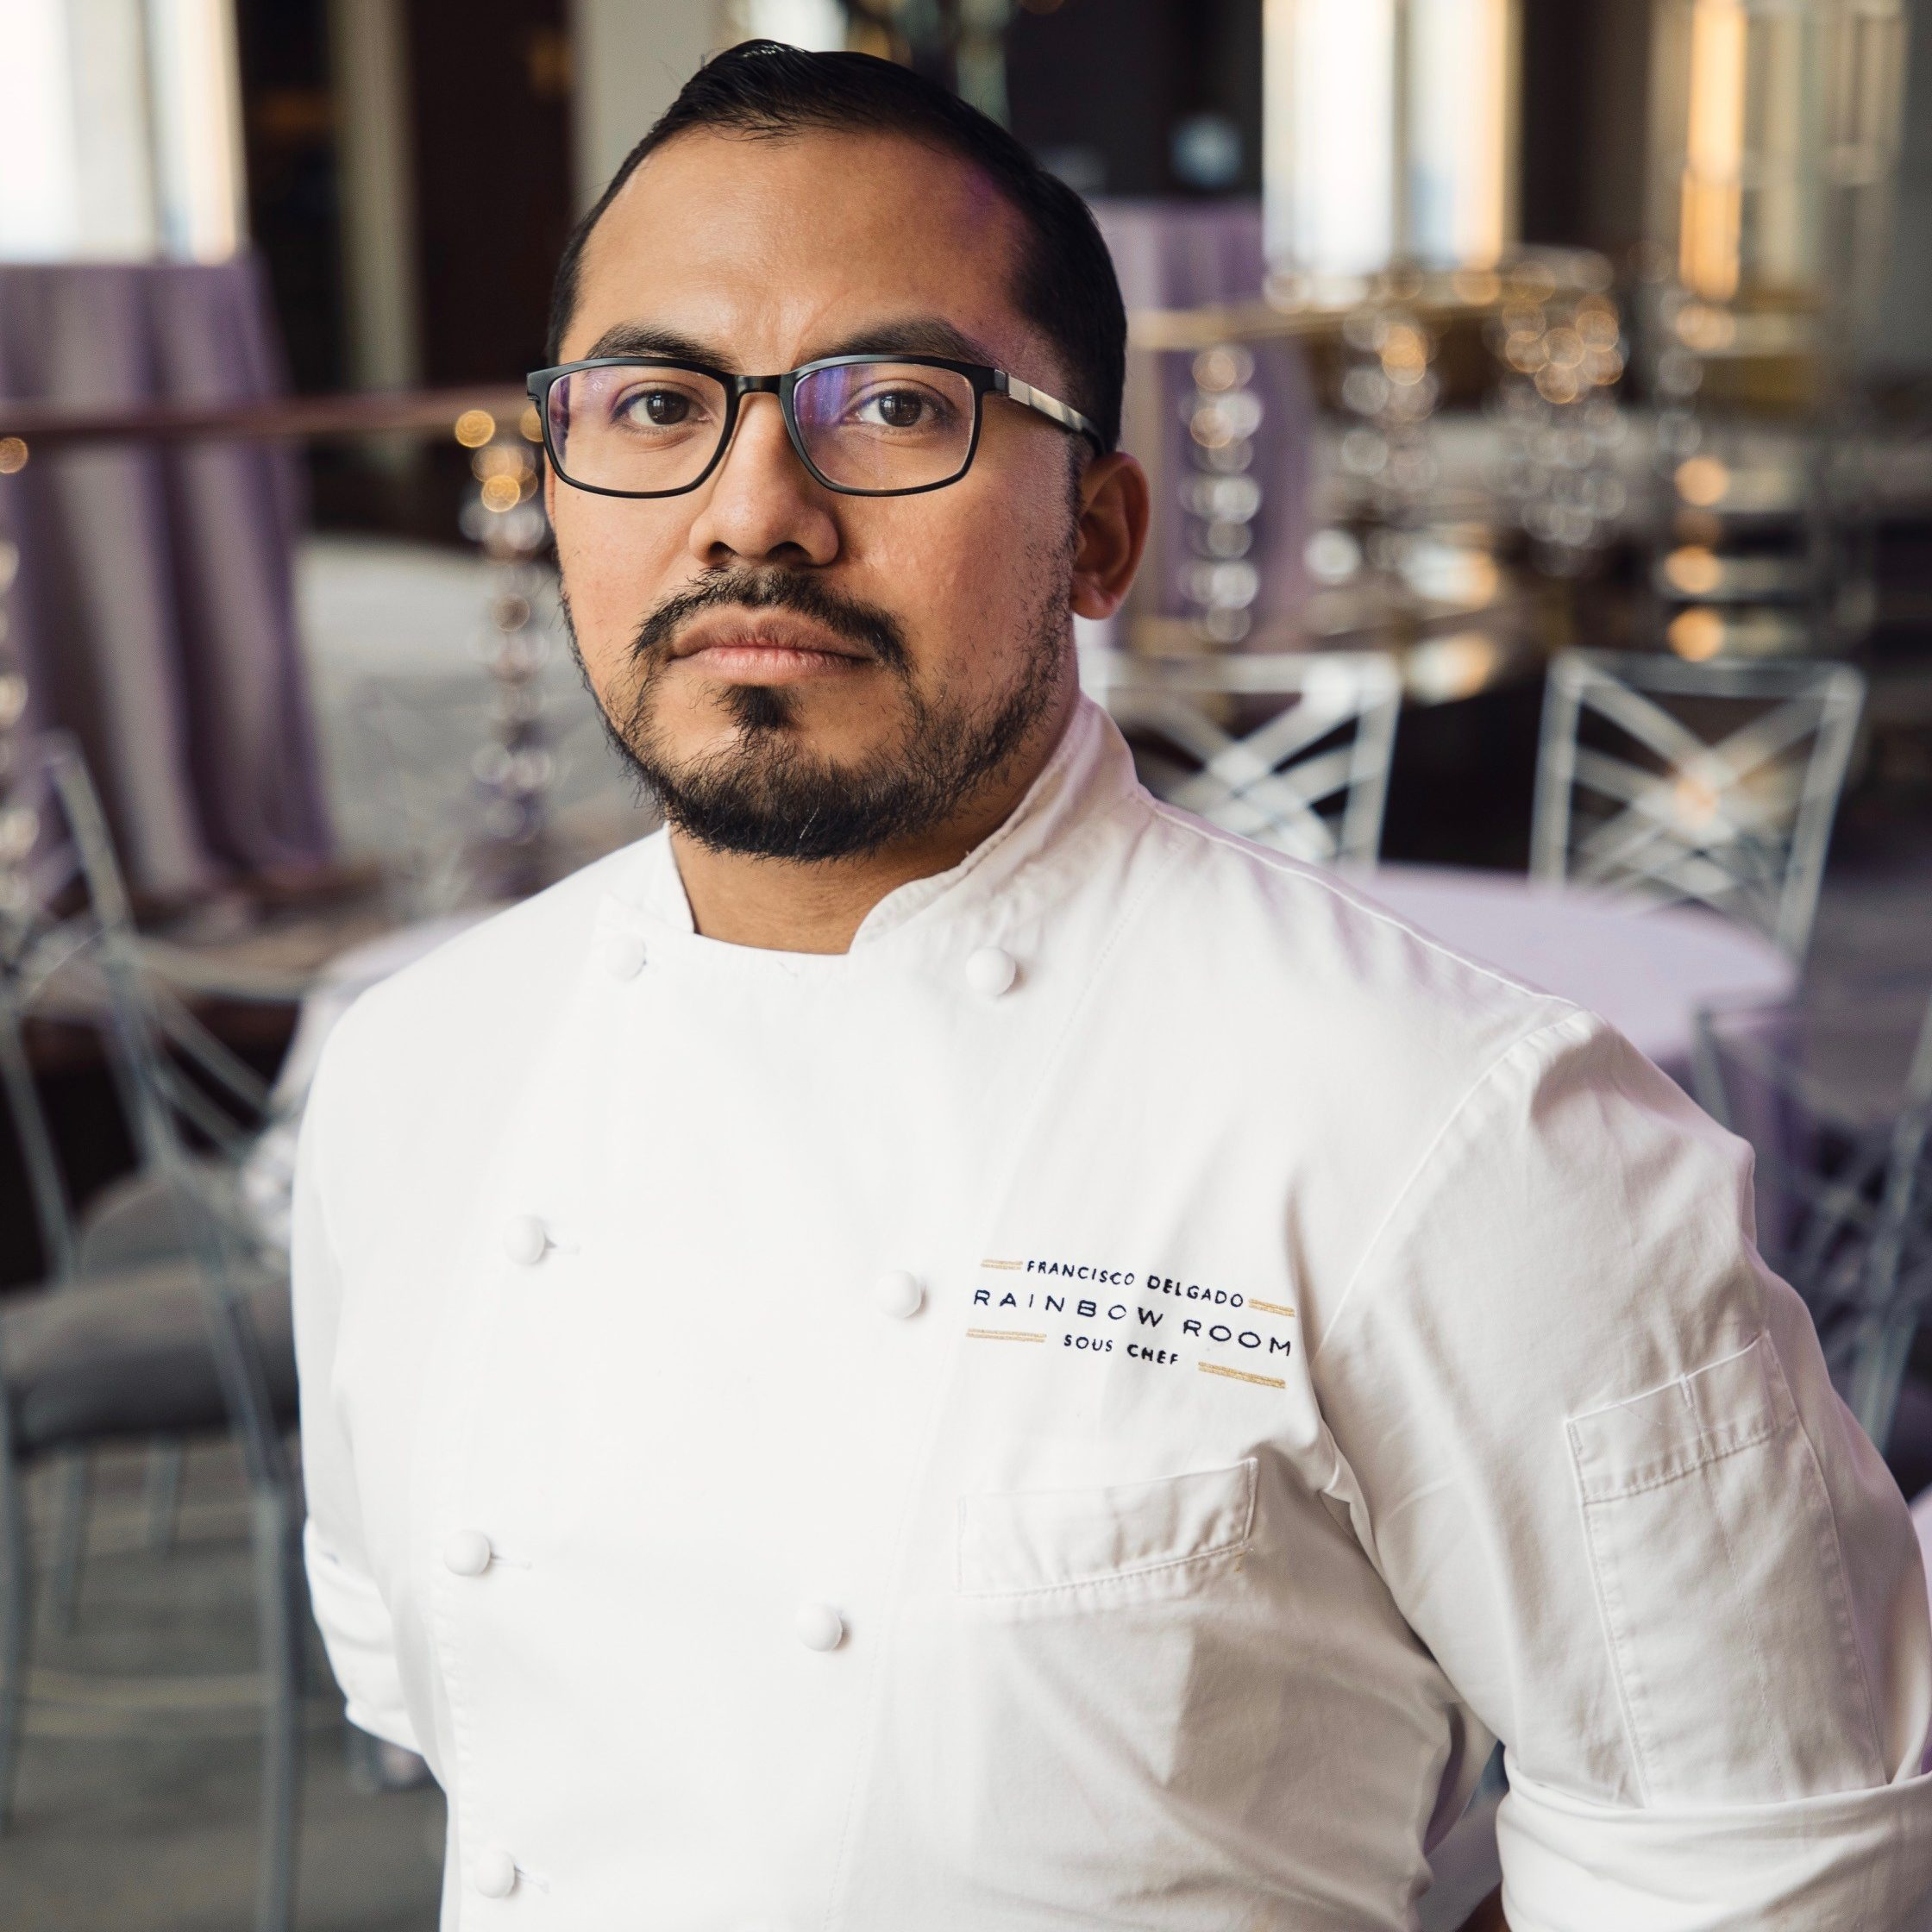 Rainbow Room - Chef Francisco Delgado - Headshot